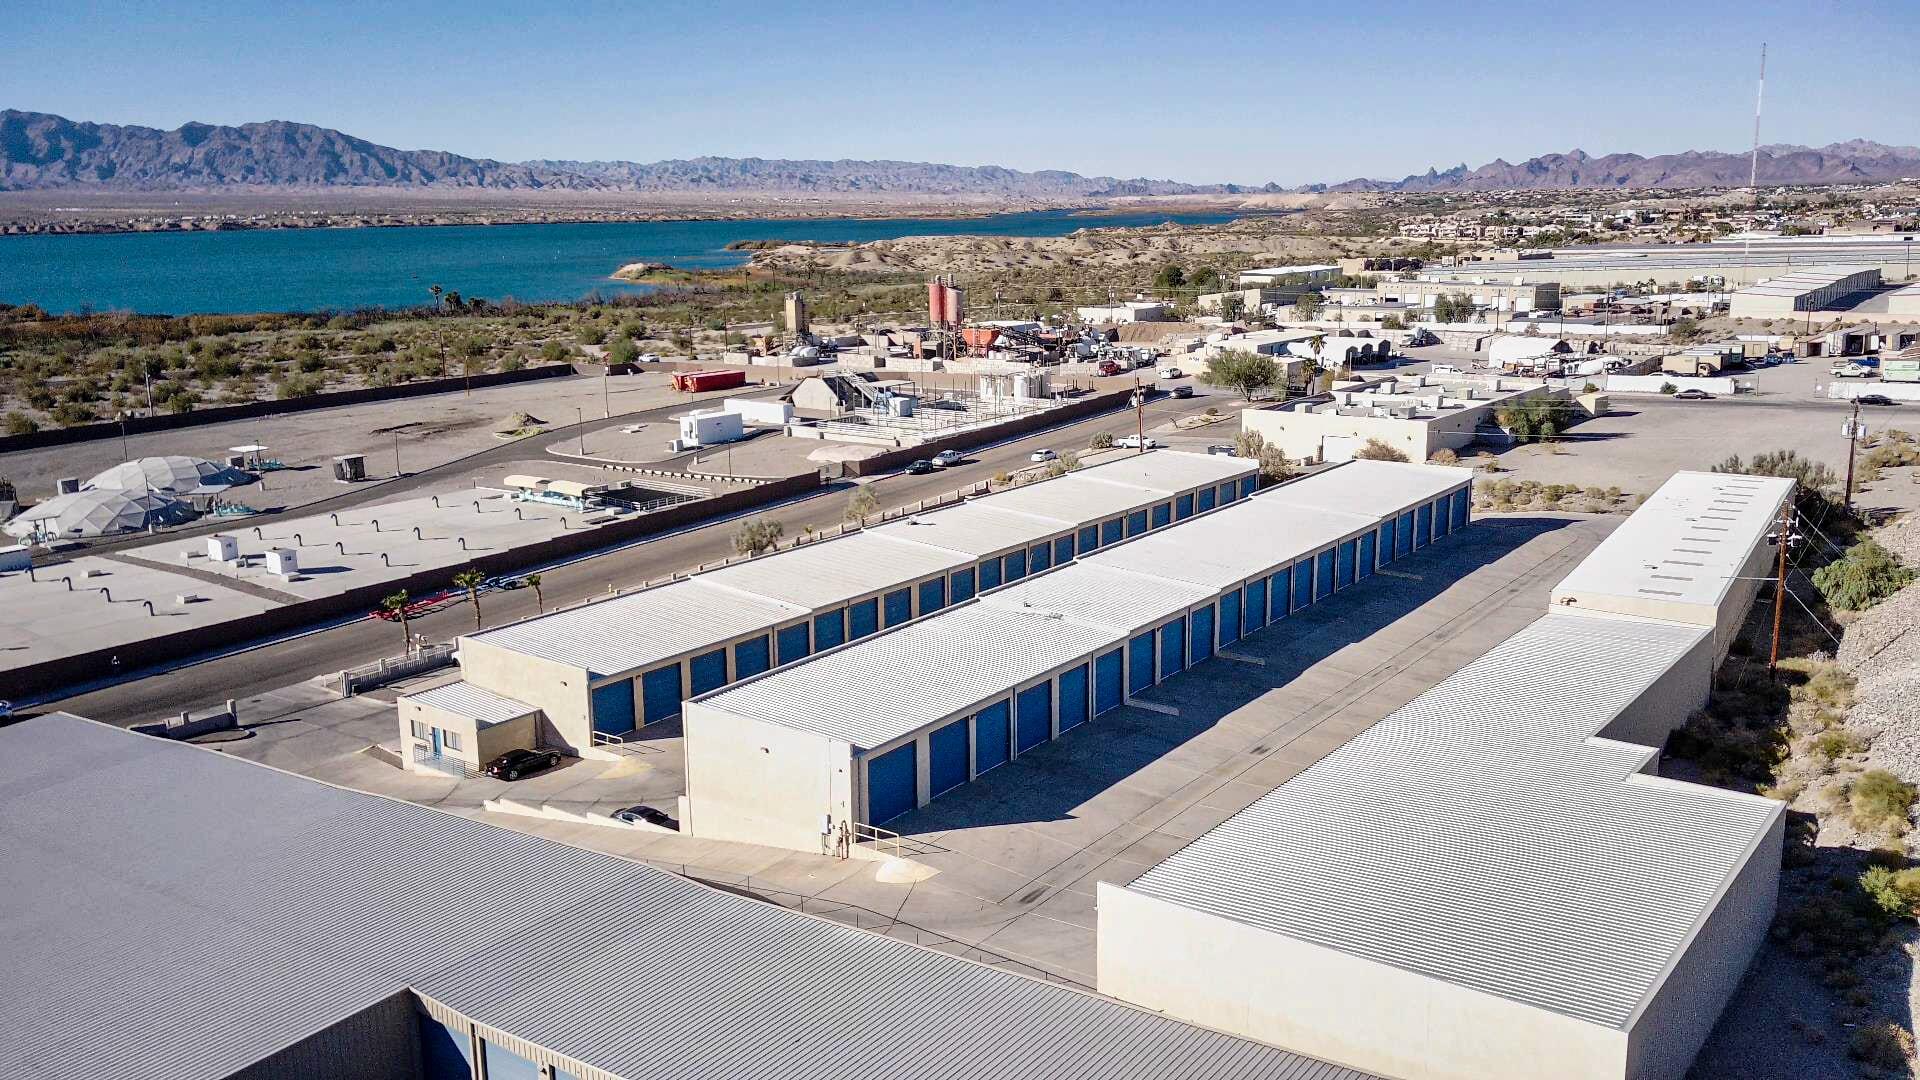 The Gorden Group Announces Sale of Lakeside Storage in Lake Havasu City, Arizona.